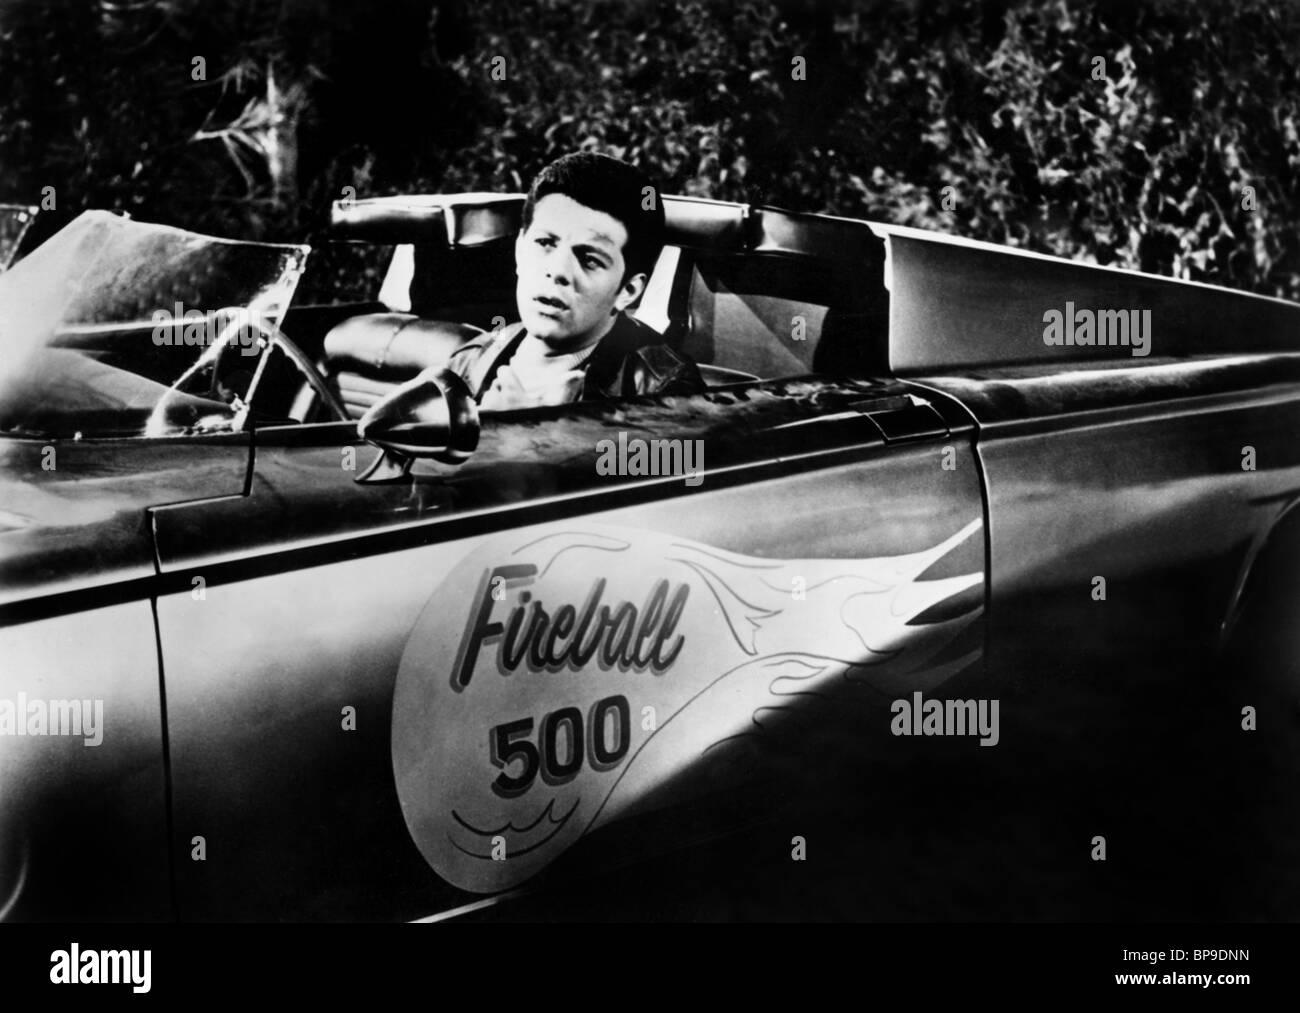 FABIAN FIREBALL 500 (1966) - Stock Image